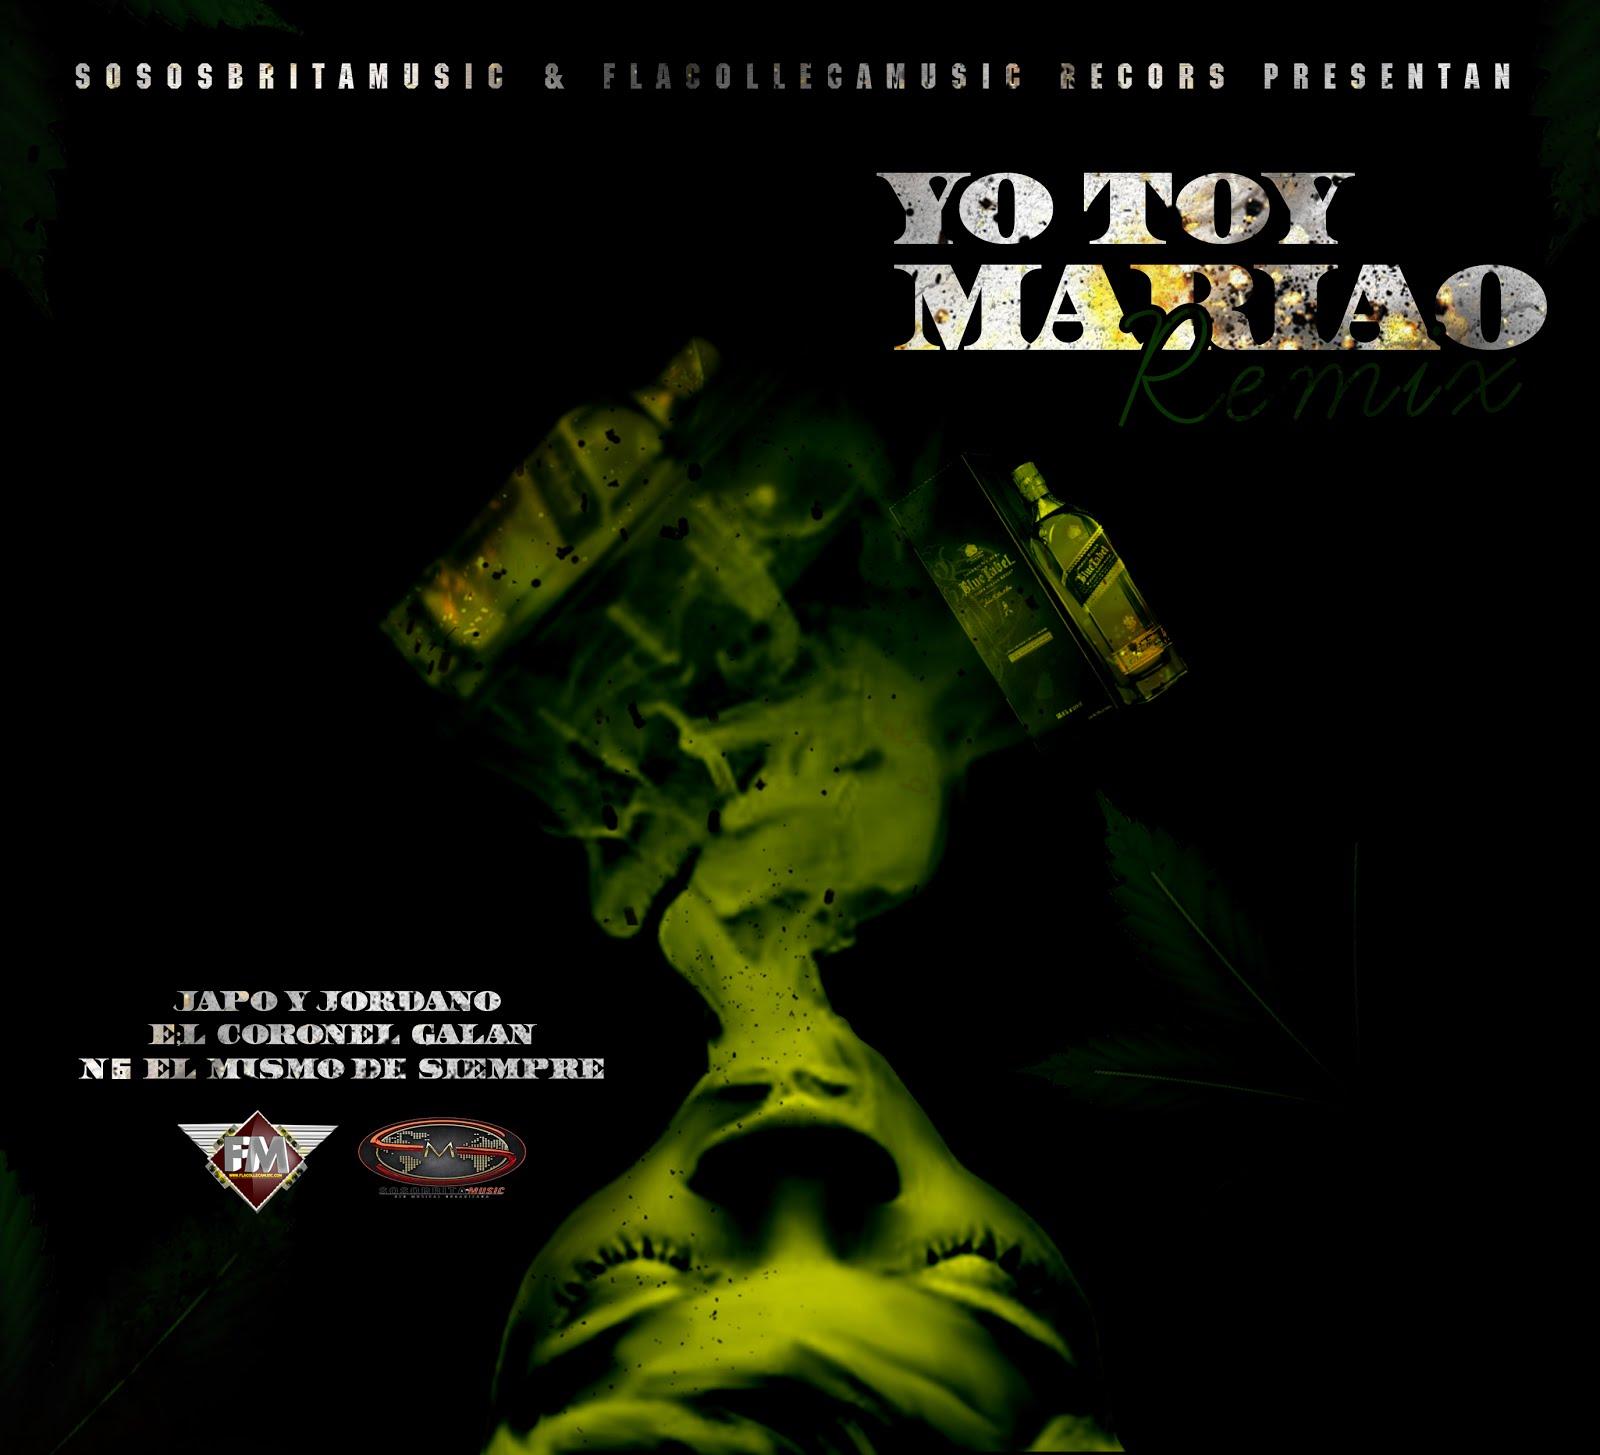 Yo Toy Mariao Remix Japo Y Jordano